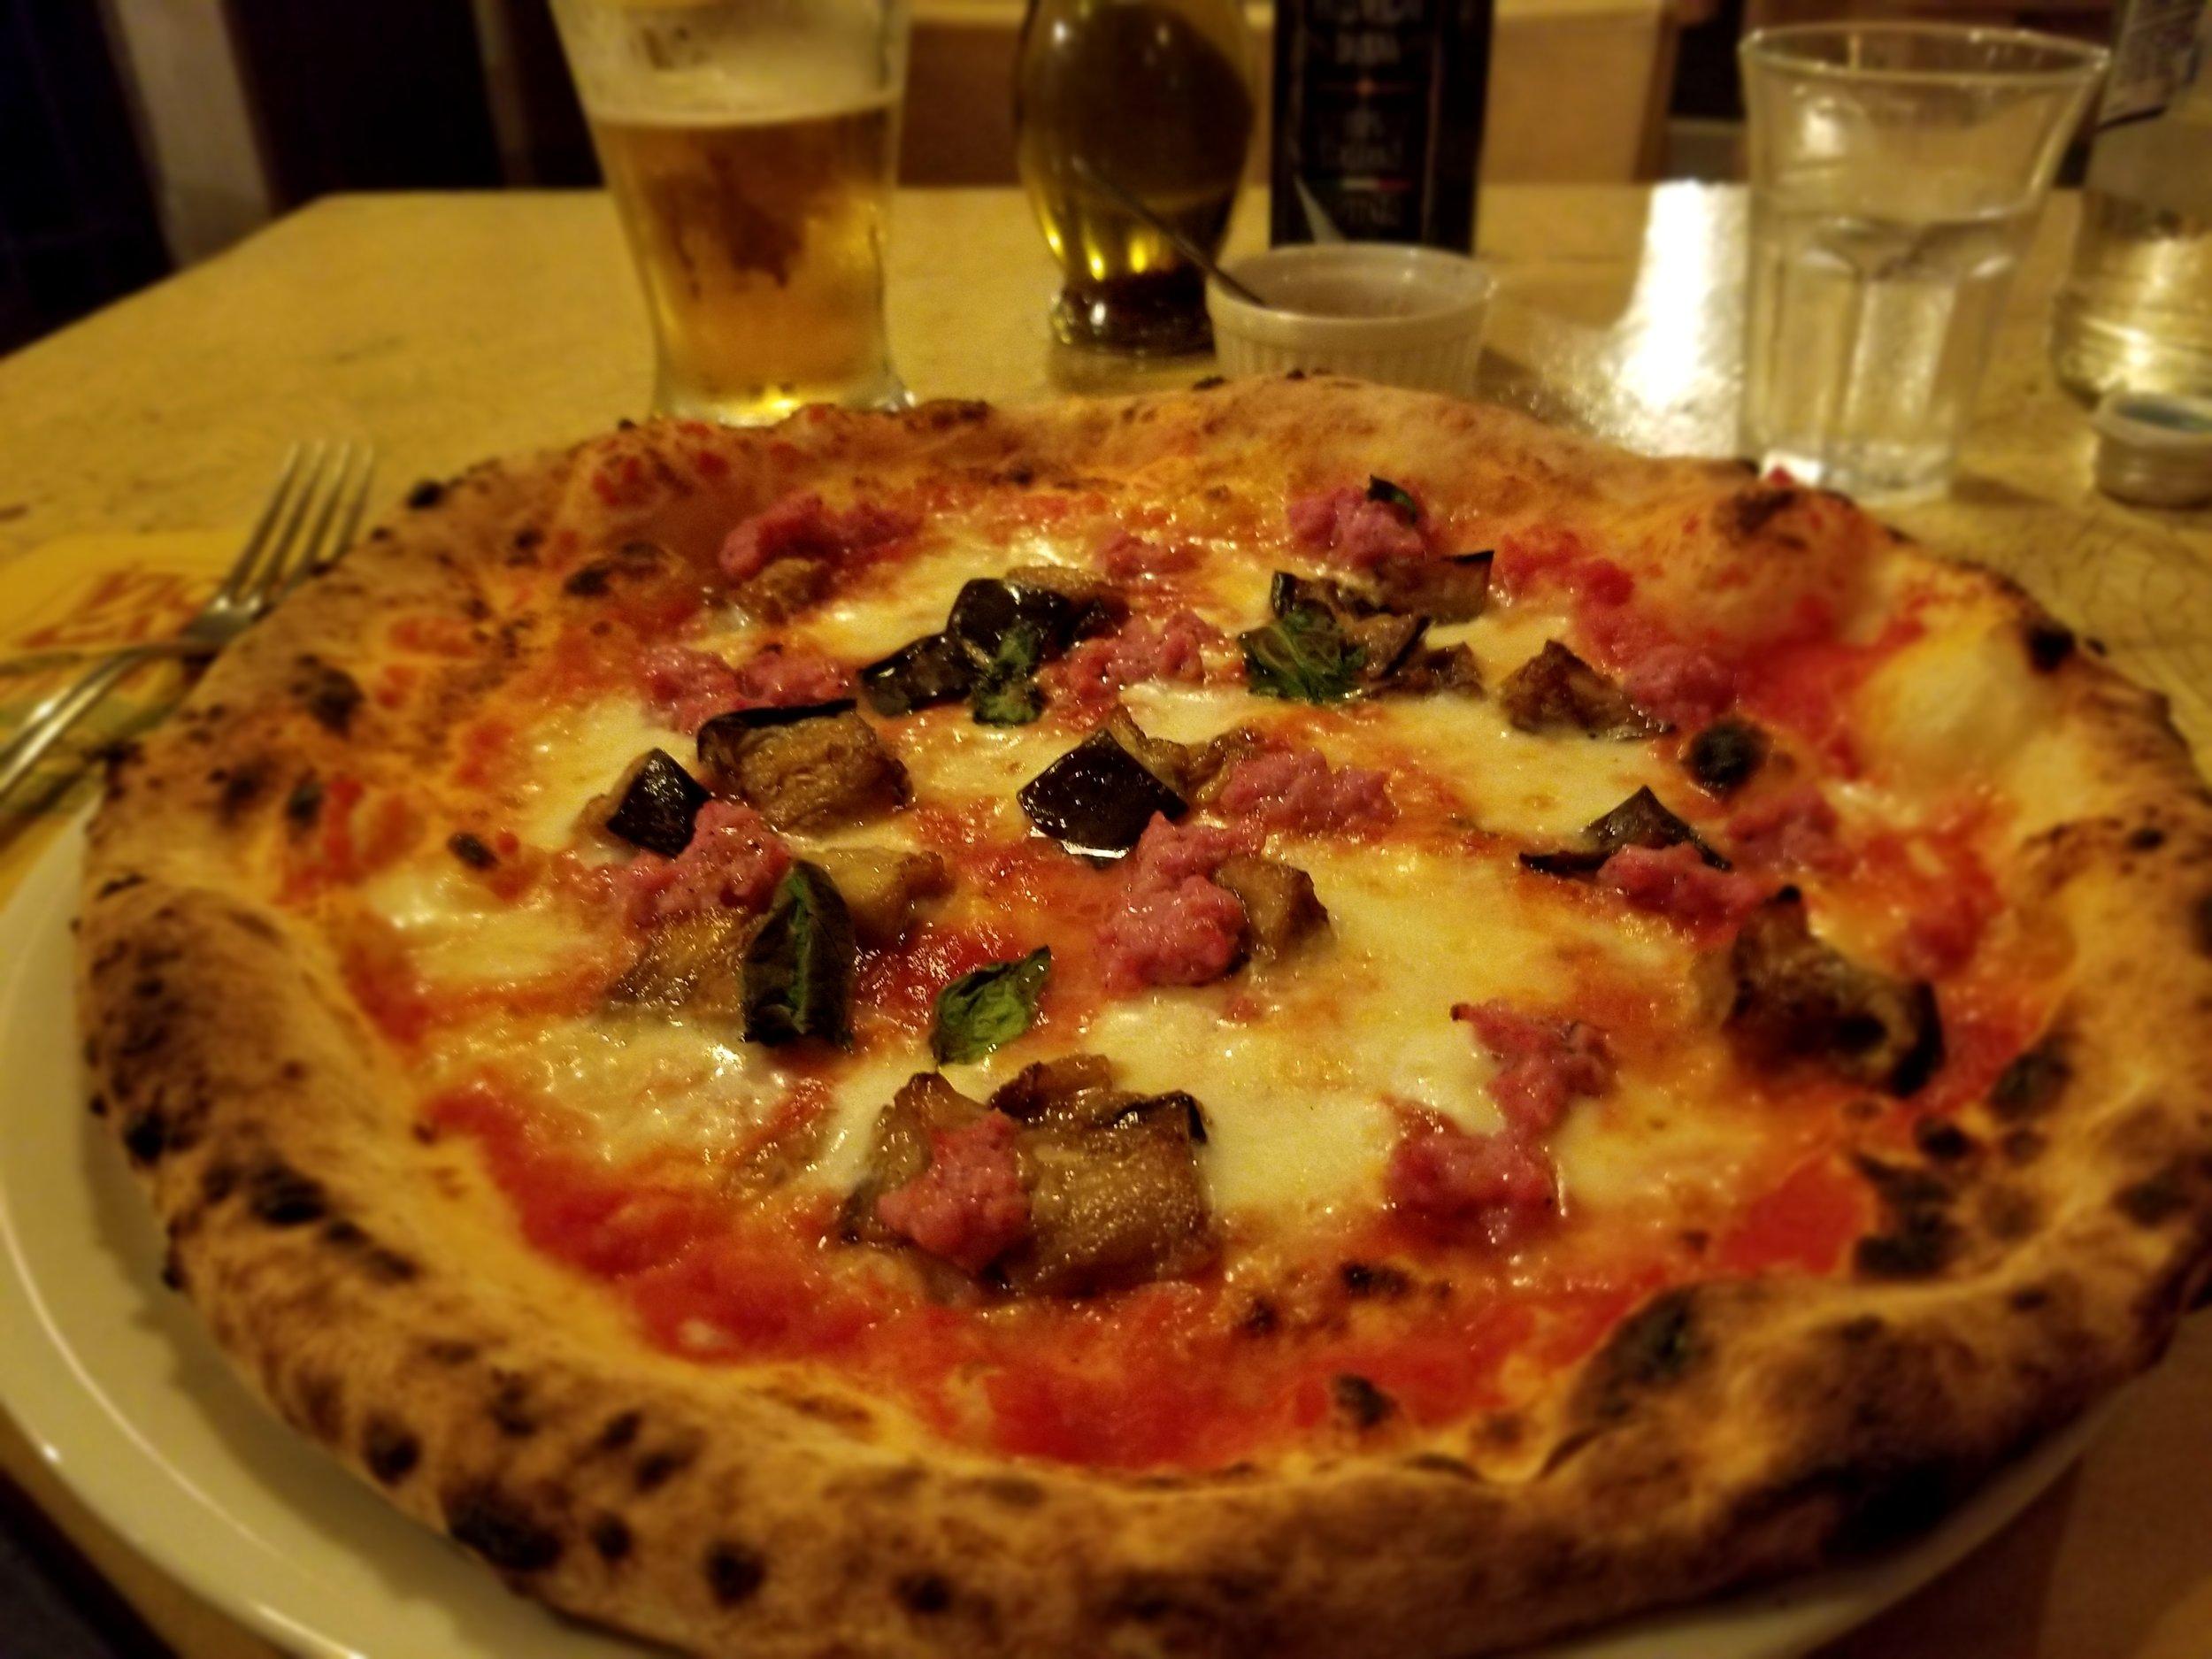 Chris' favorite Florentine pizza!